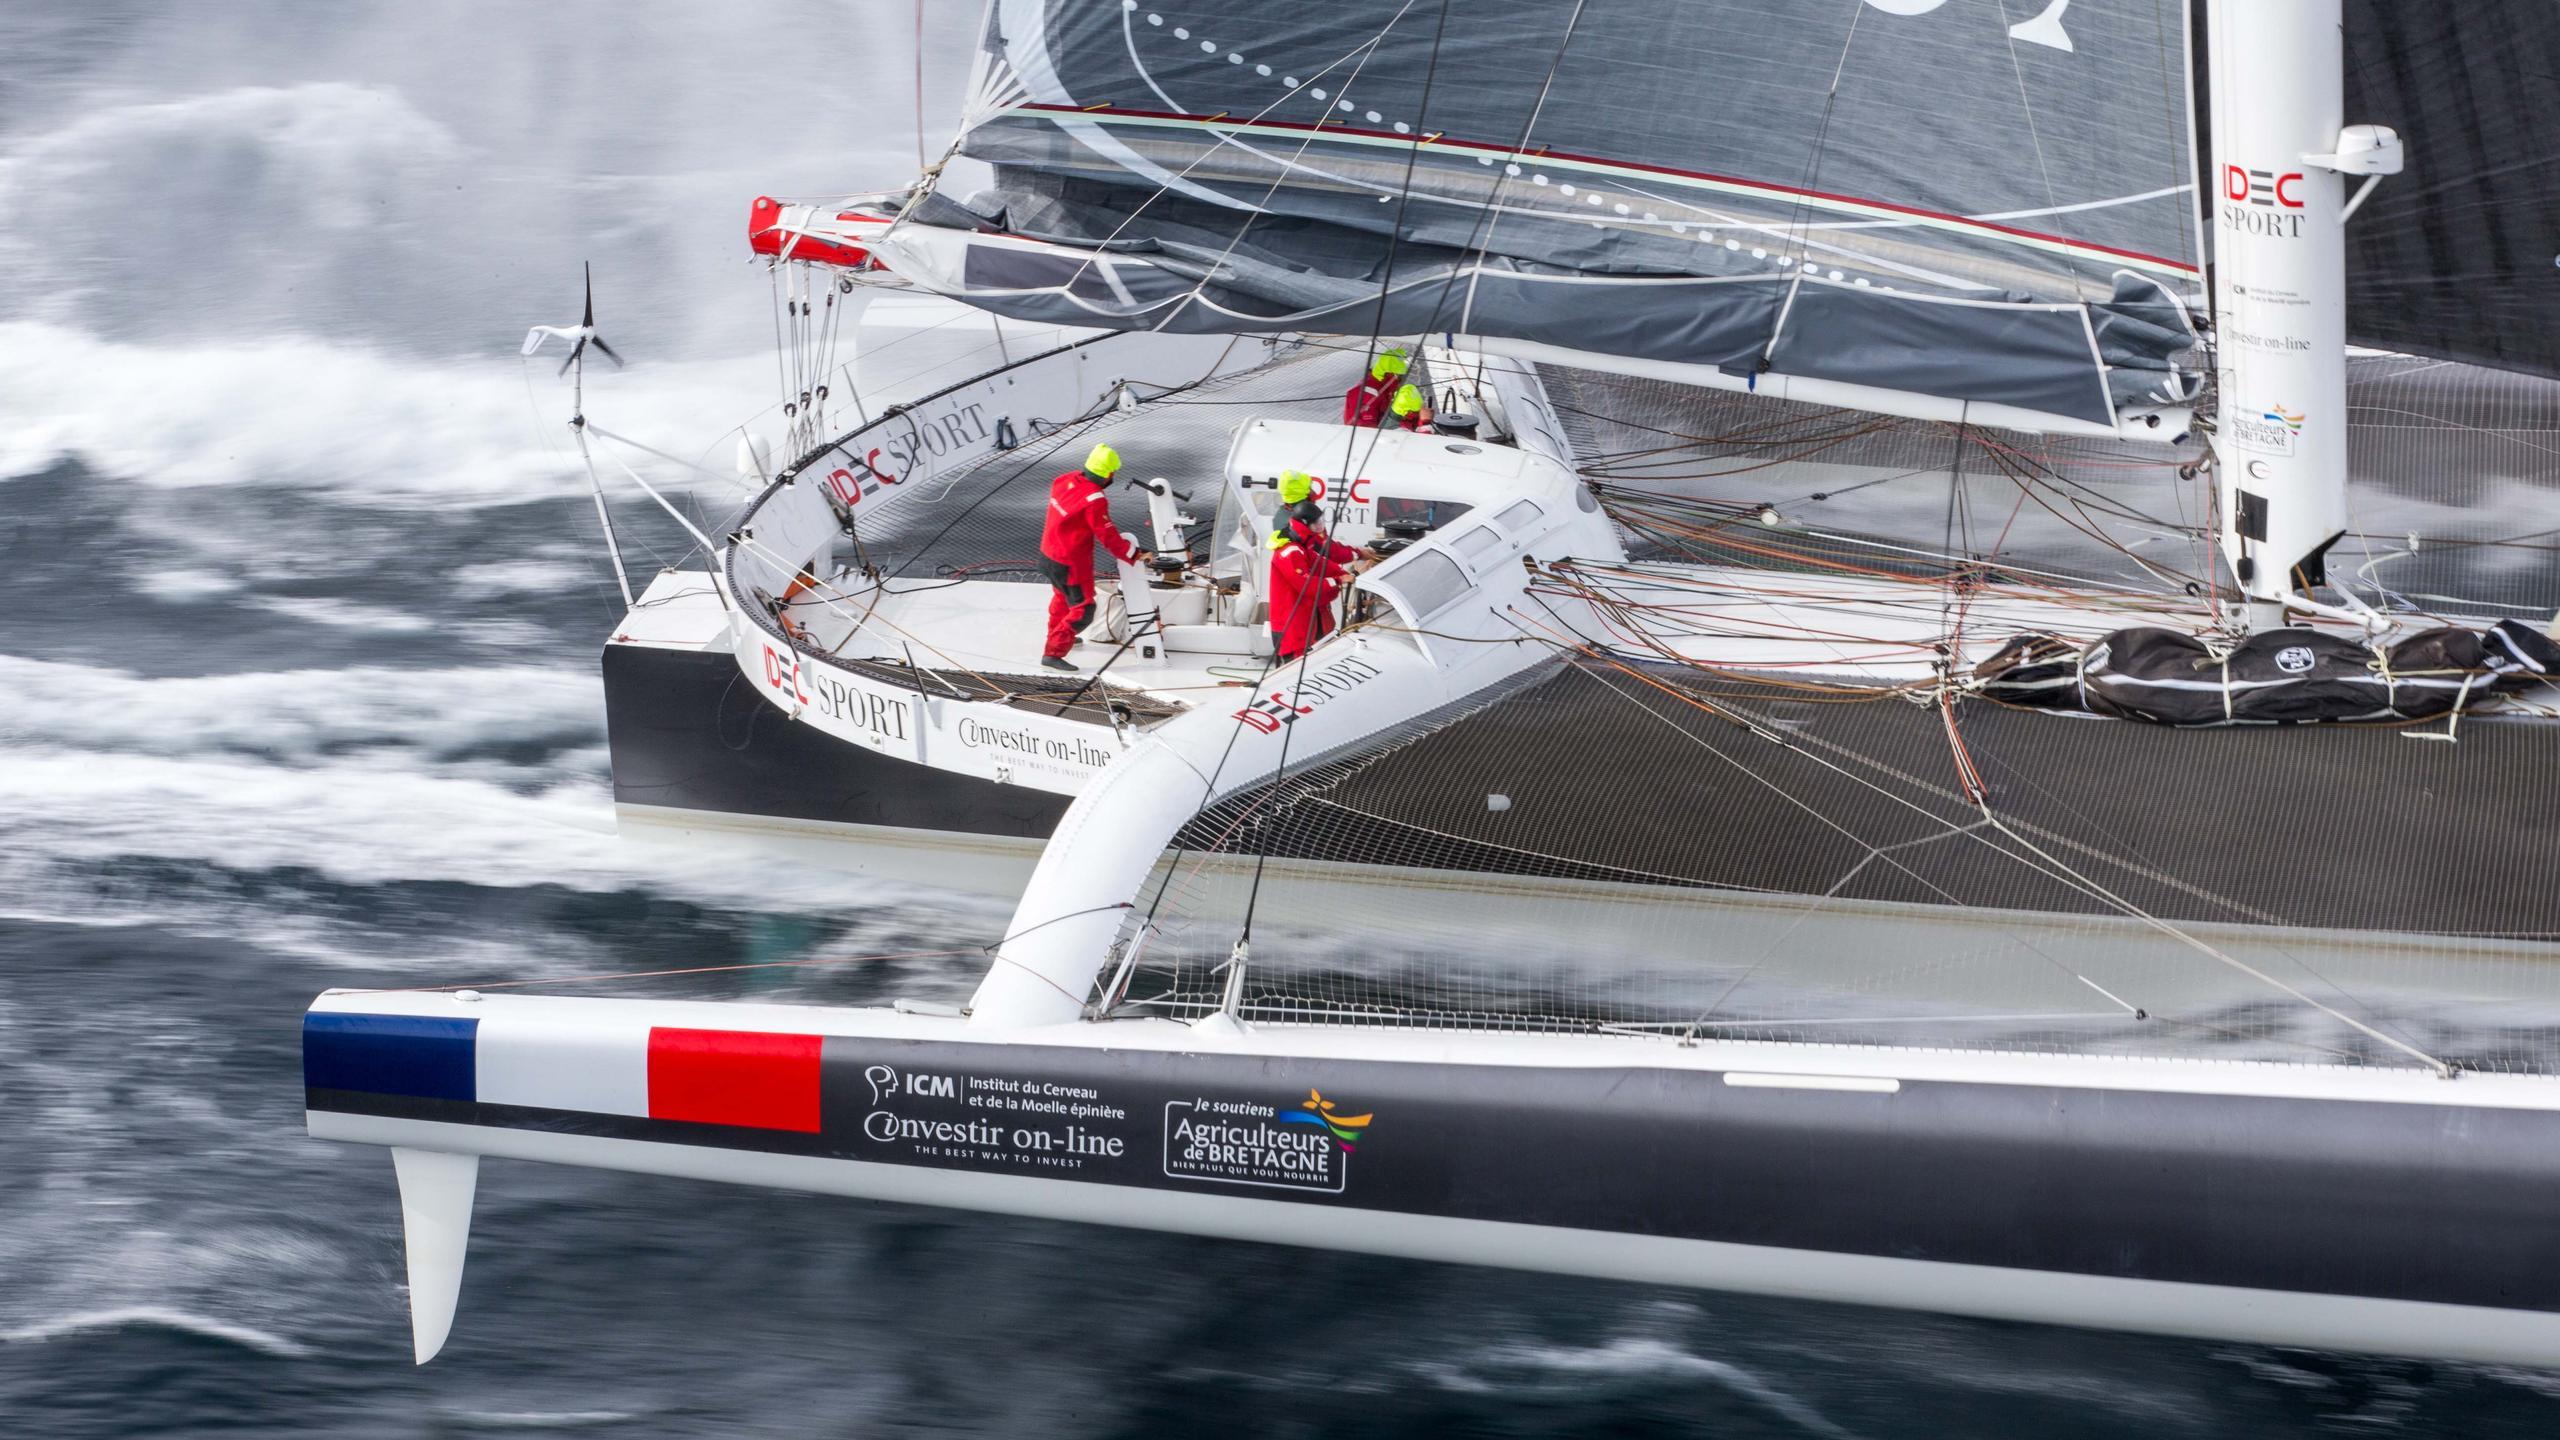 idec sport trimaran racing yacht multiplast 2006 31m cockpit